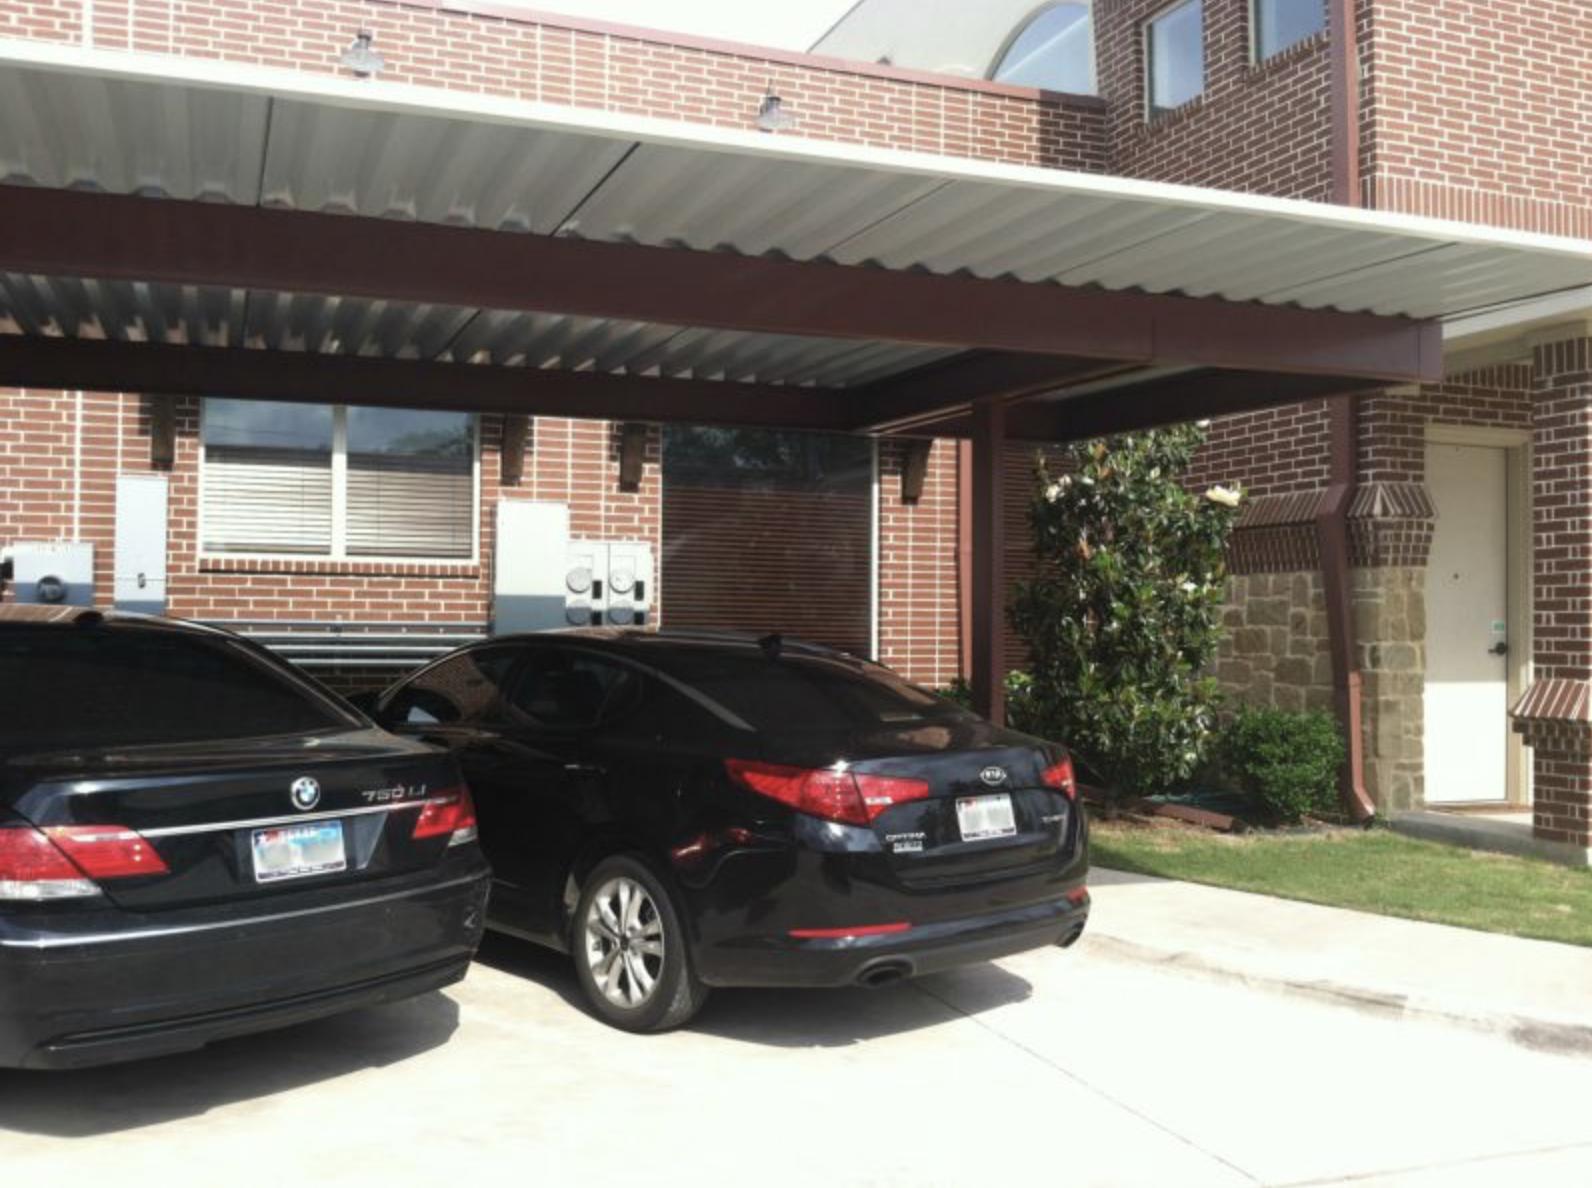 Large Commercial Carport Company Blog